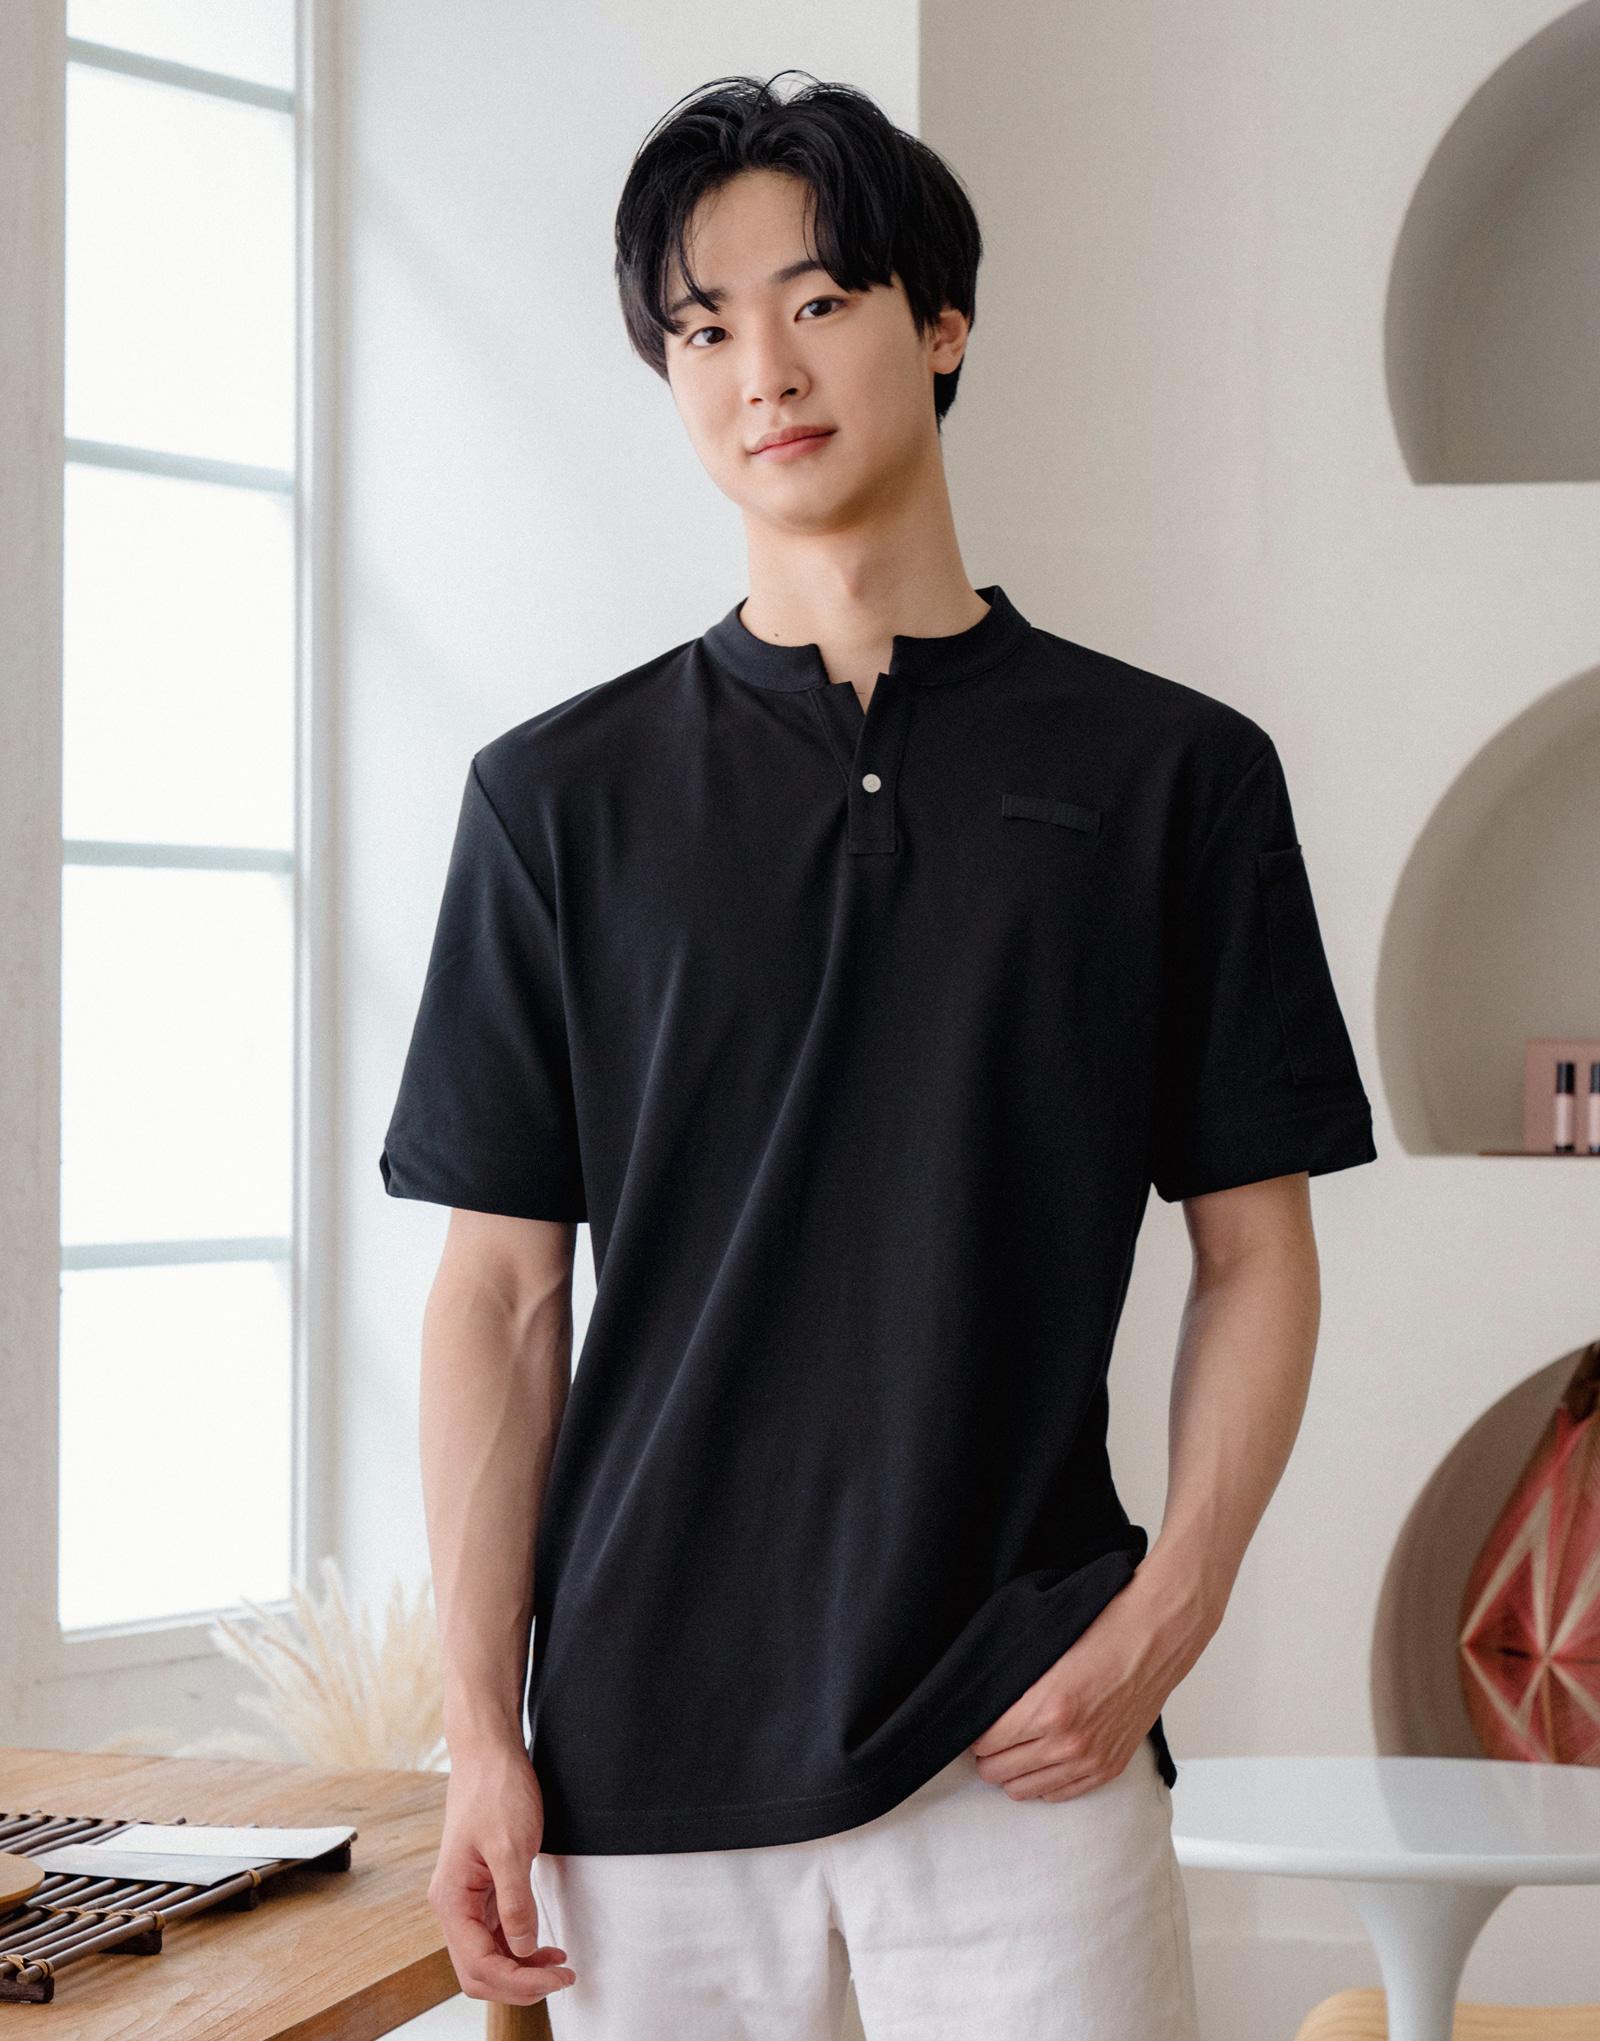 China kara one button PK T-shirt #AT1997 Black